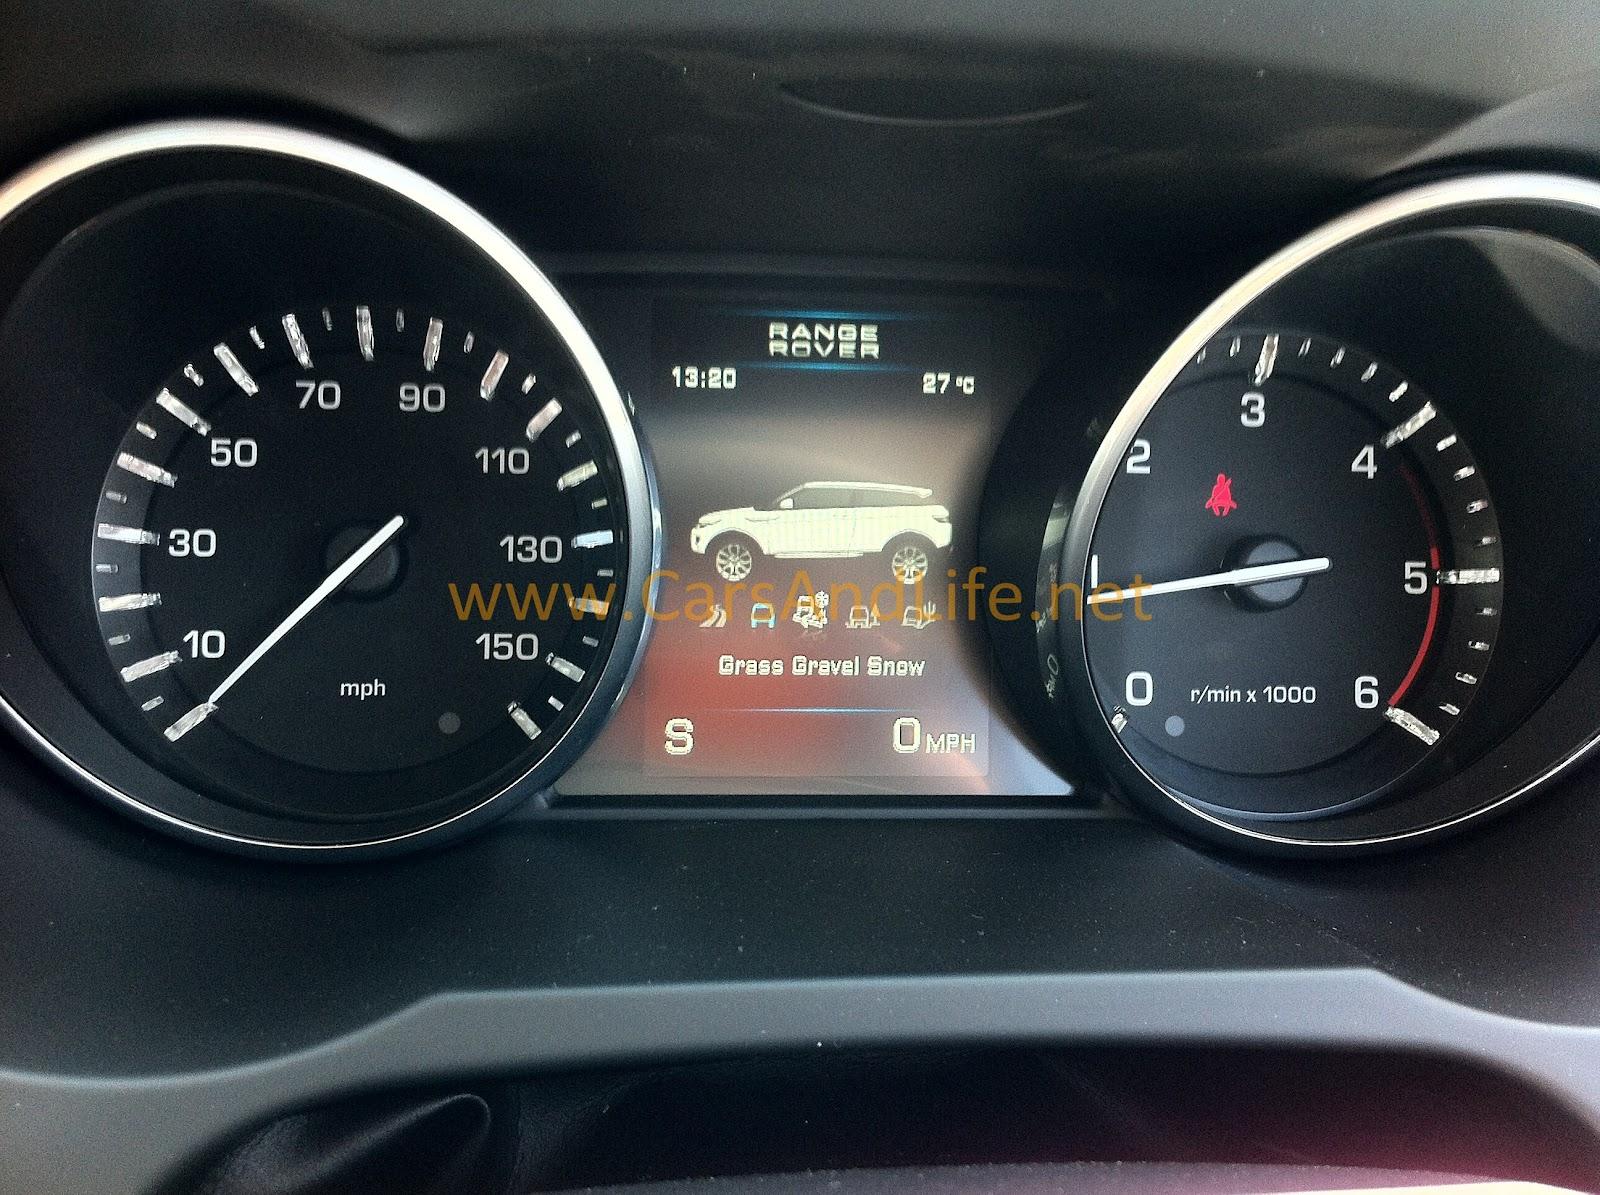 Range Rover Evoque: New Photos - cars & life | cars fashion ...